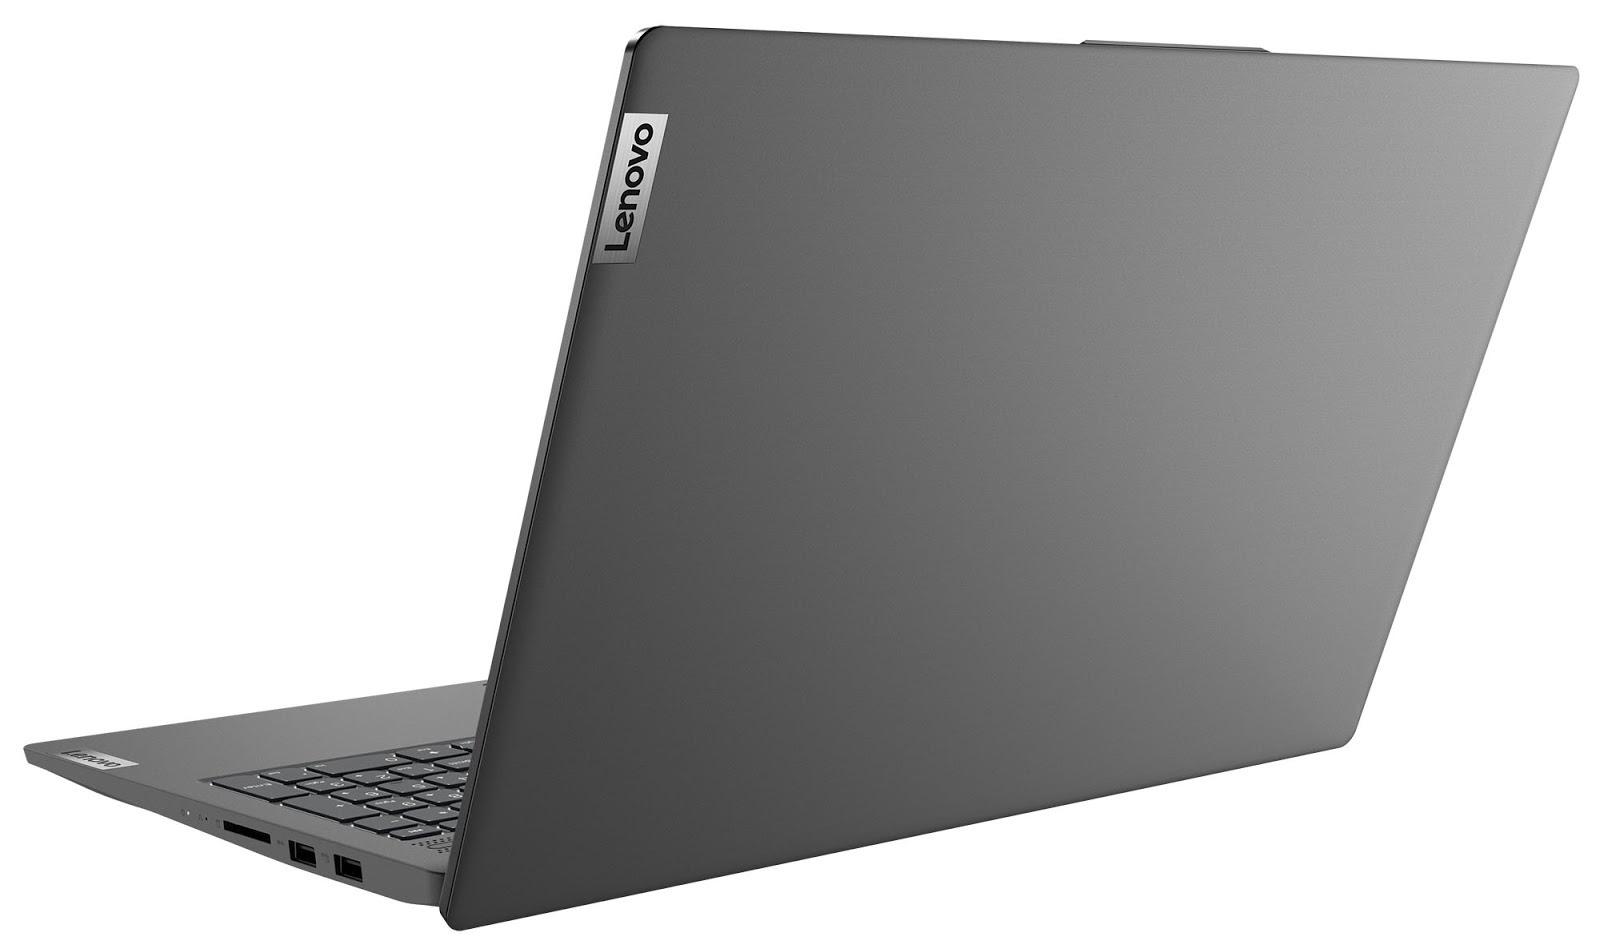 Фото 1. Ноутбук Lenovo ideapad 5-15IIL05 Graphite Grey (81YK006HRE)